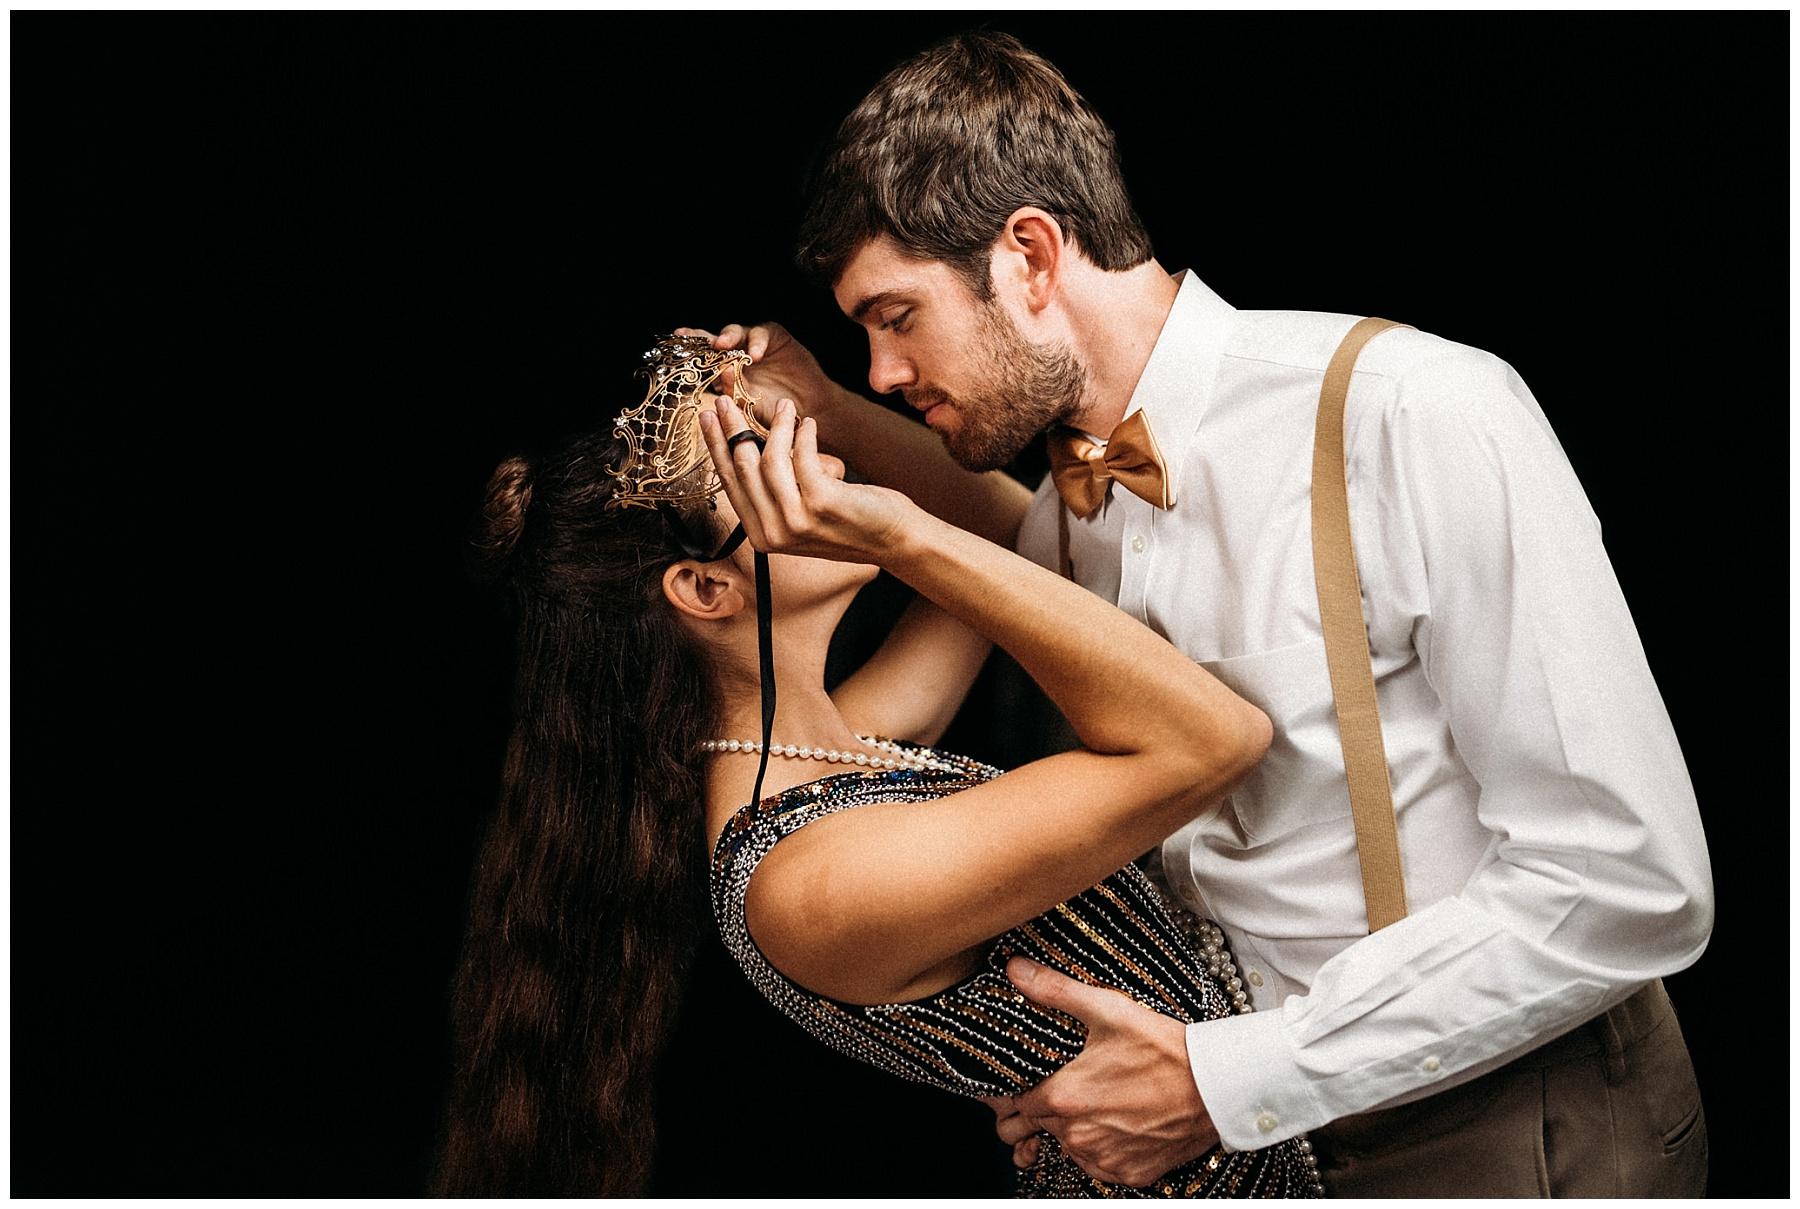 gatsby-styled-couples-shoot-final-g-web-20190707-0054_CCS-1.jpg